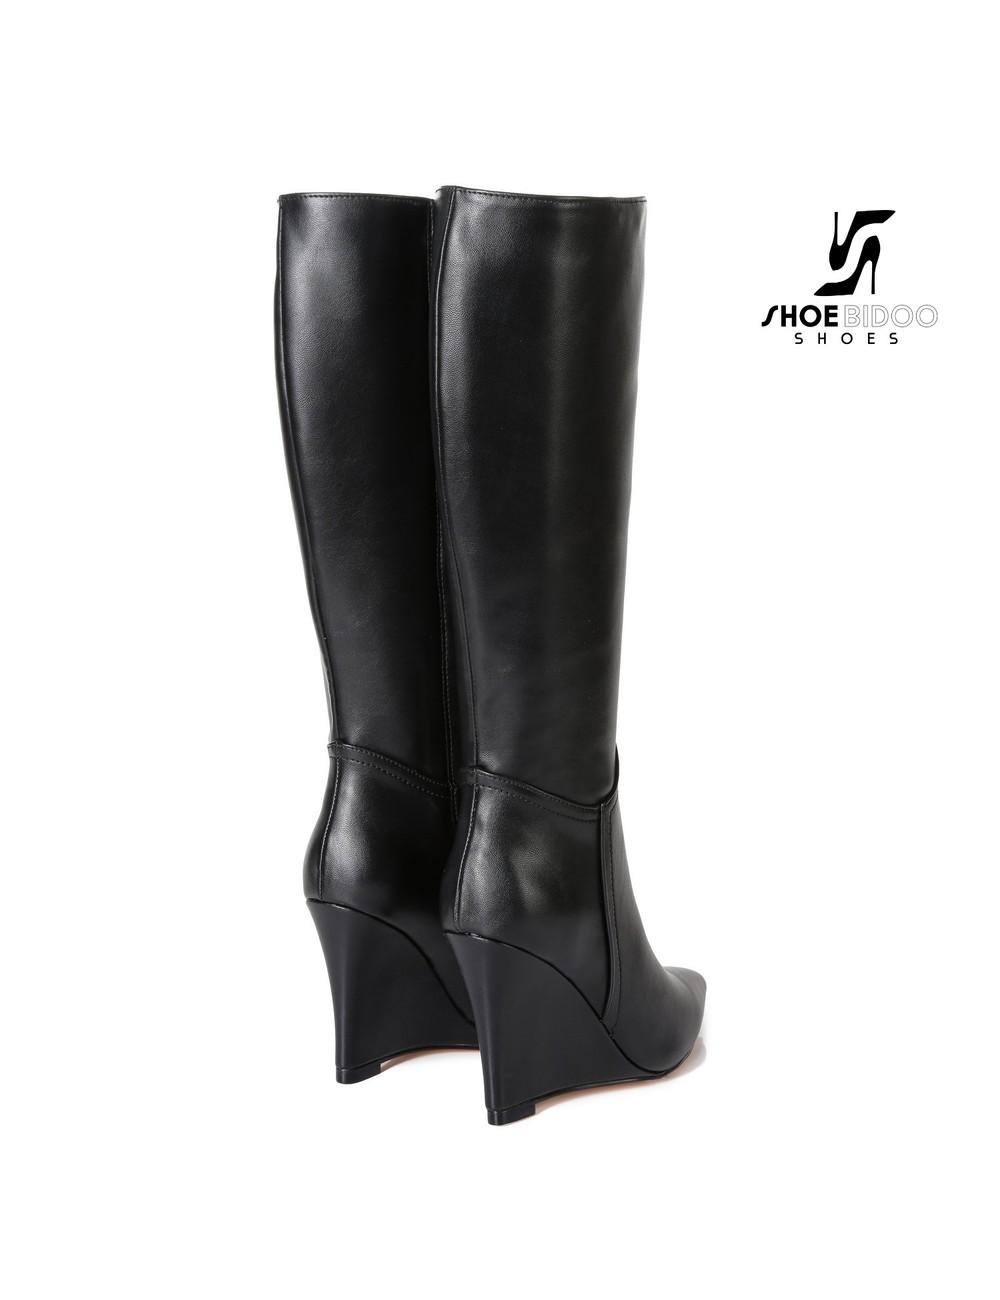 Giaro Giaro knee boots with wedge heel ELLA in black